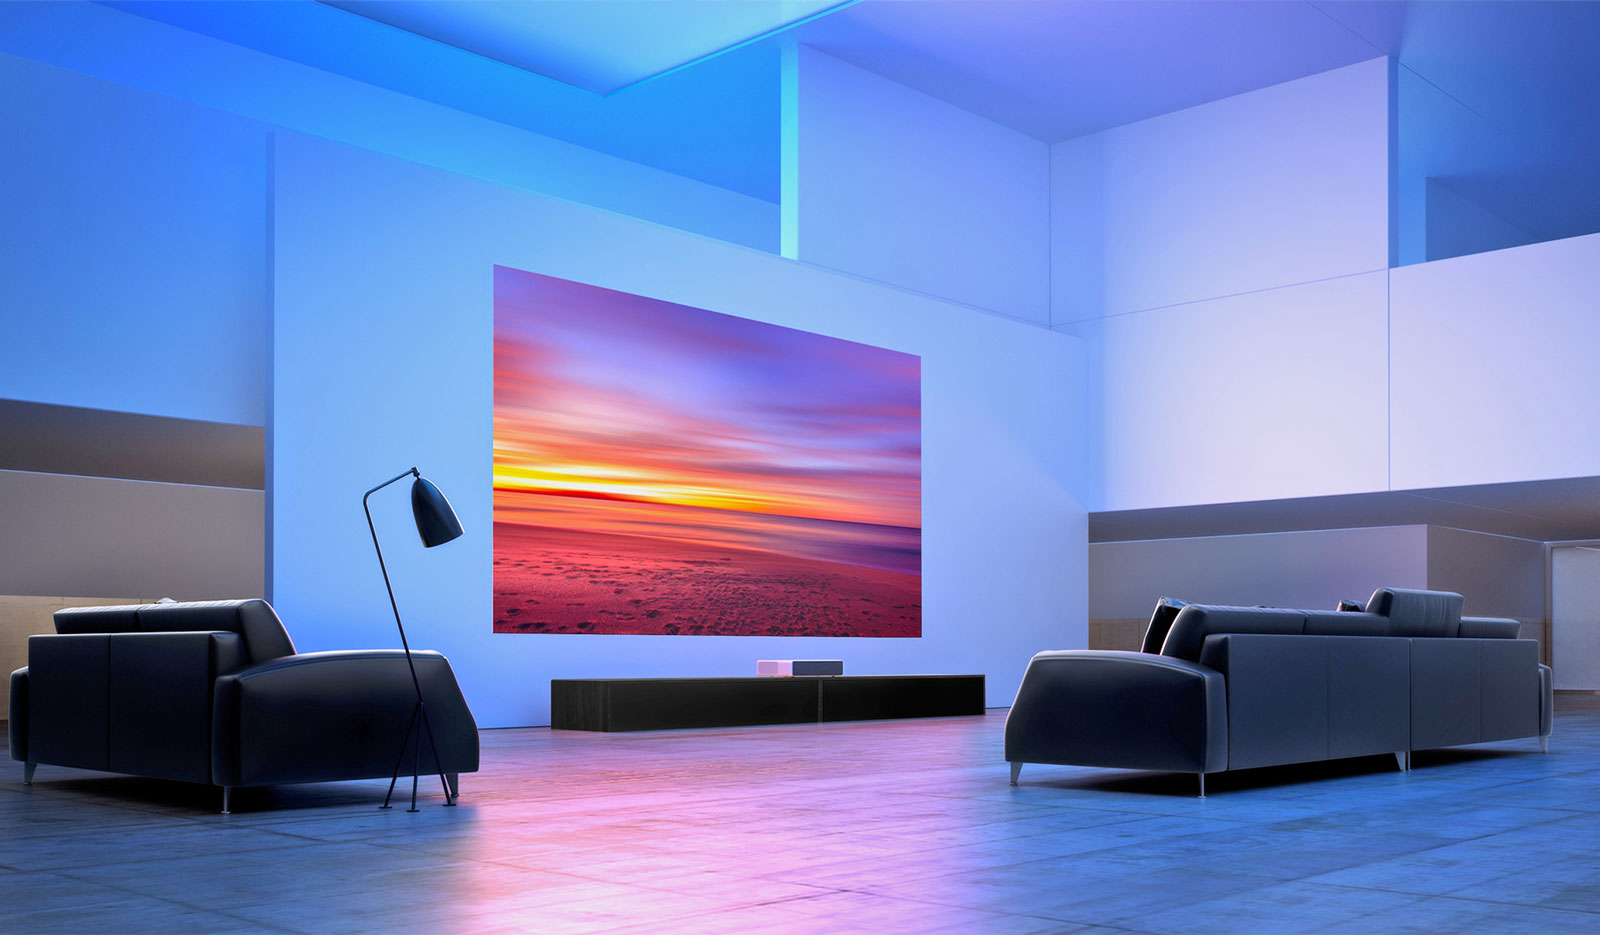 Ma 100 ezer forinttal olcsóbb a Xiaomi projektora, a jövő házimozija